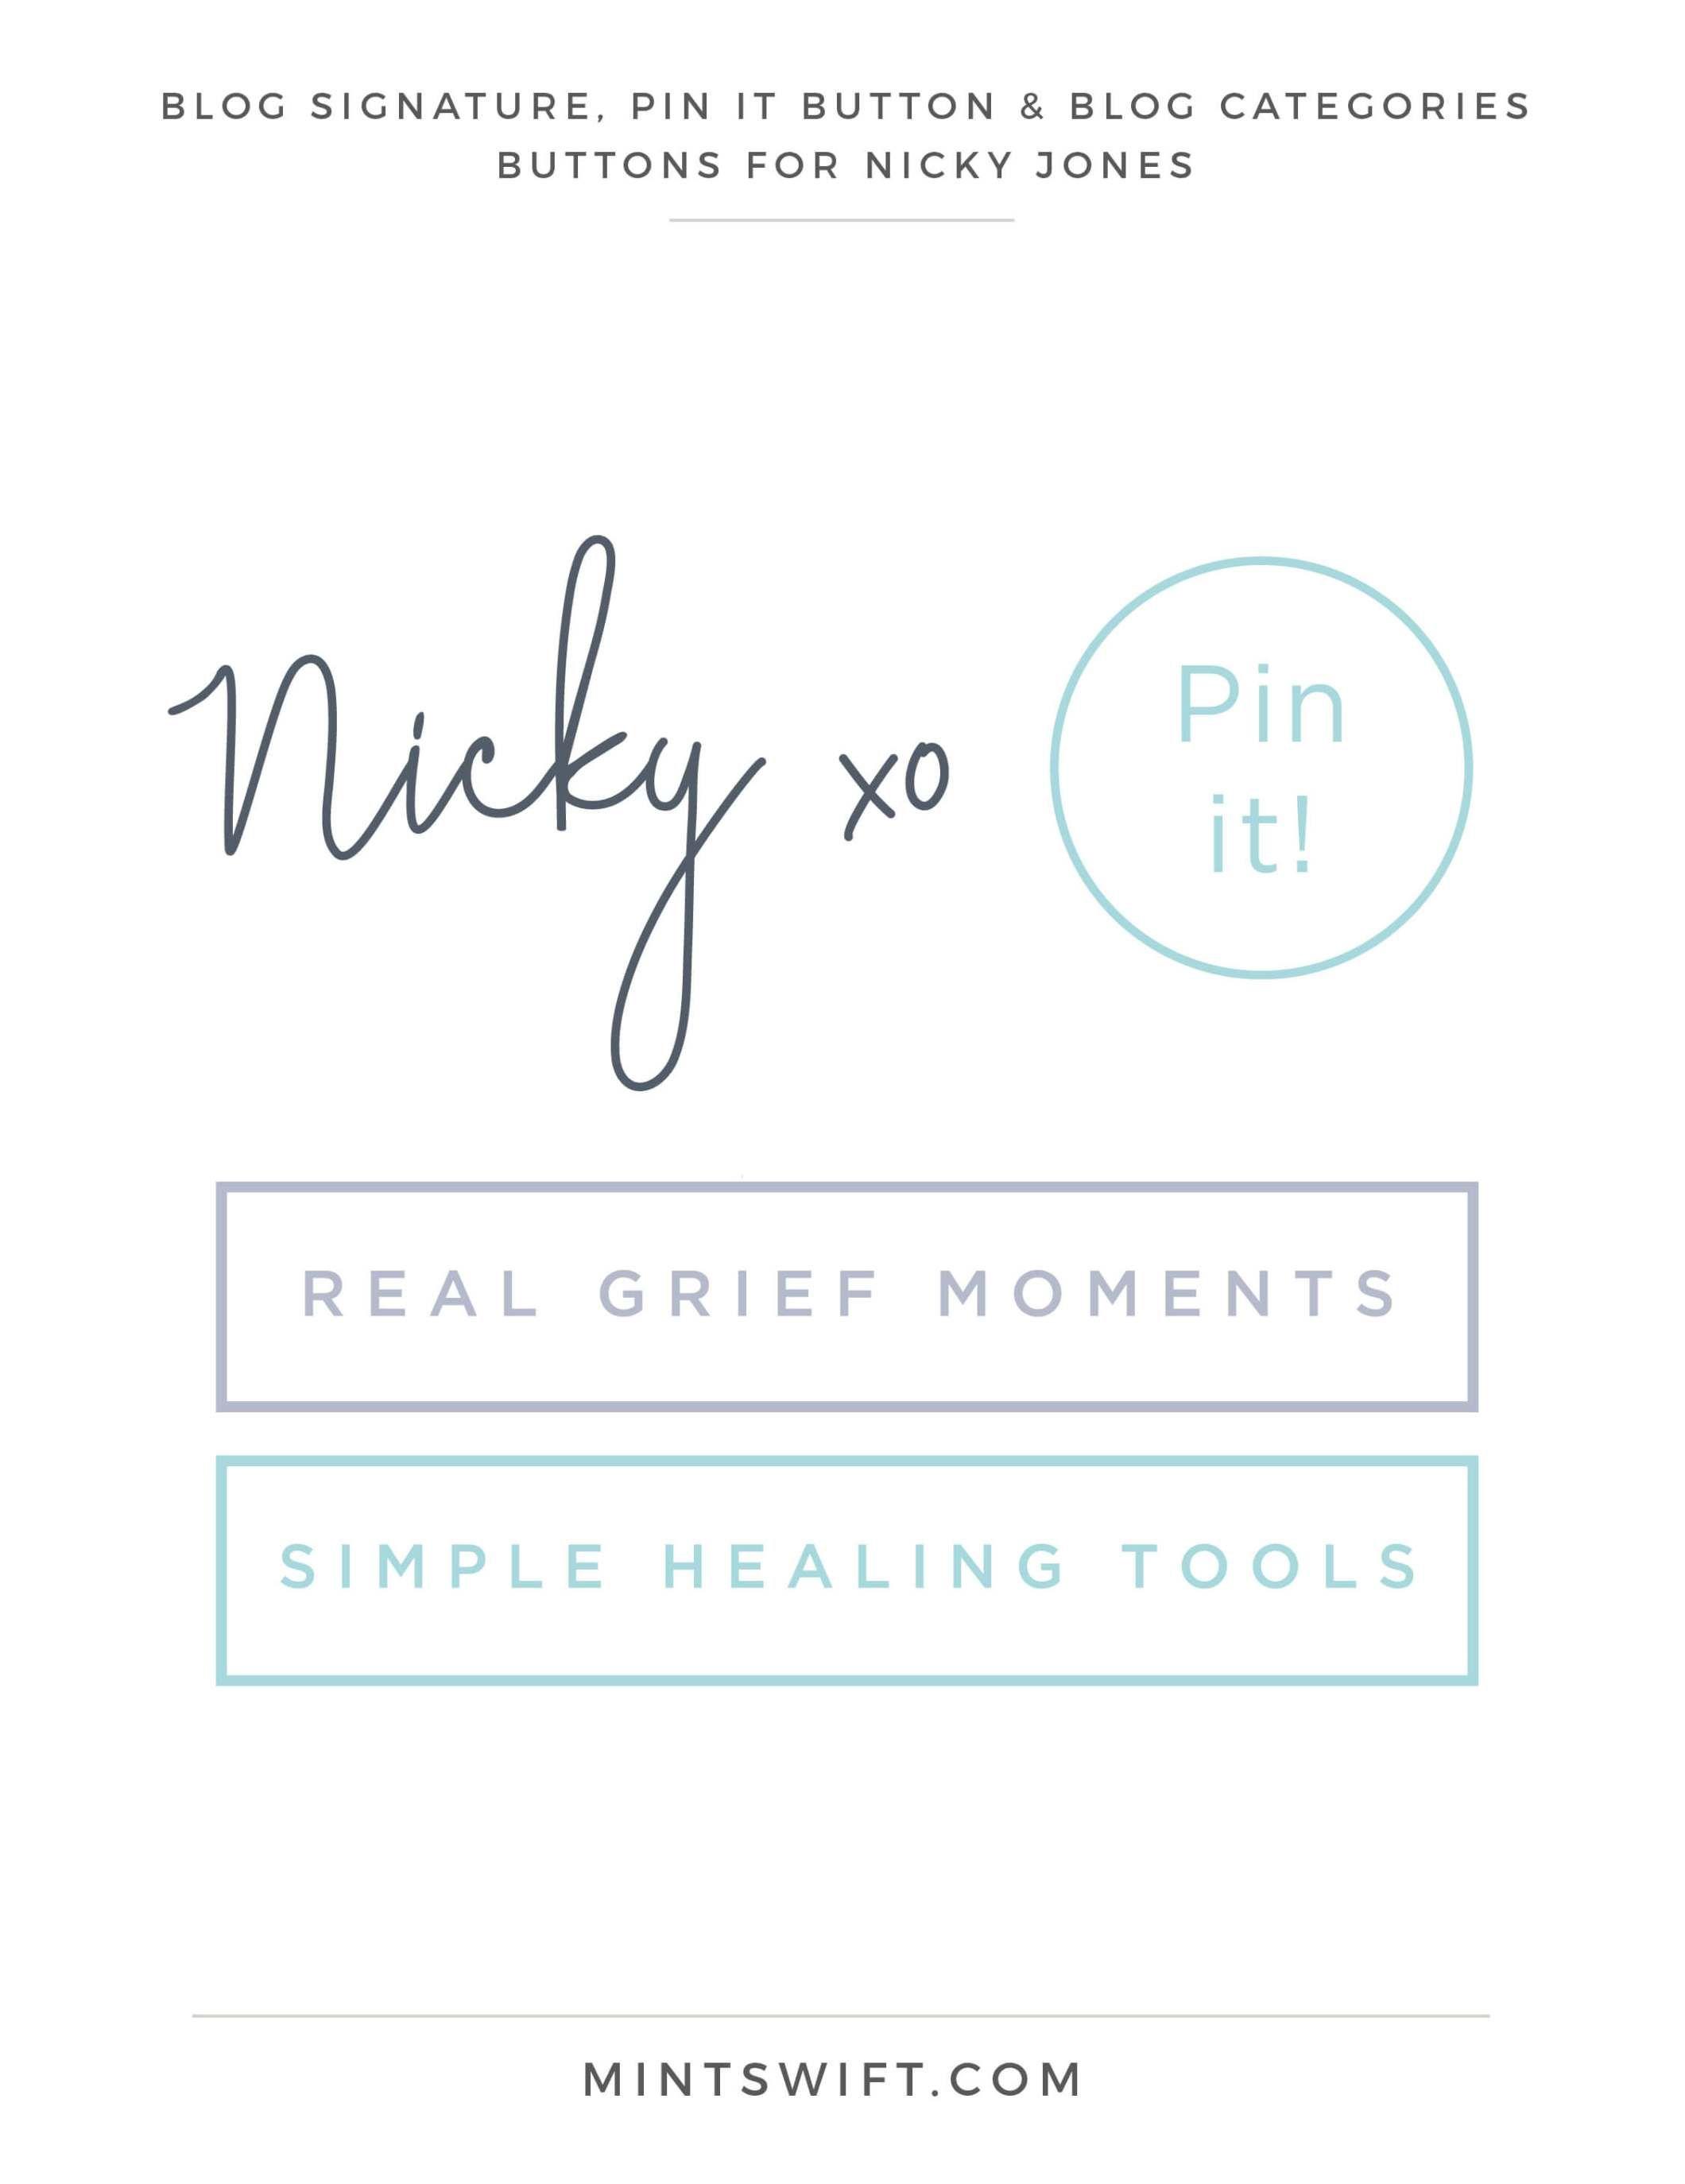 Brand Design For Nicky Jones - Brand Design - Brand